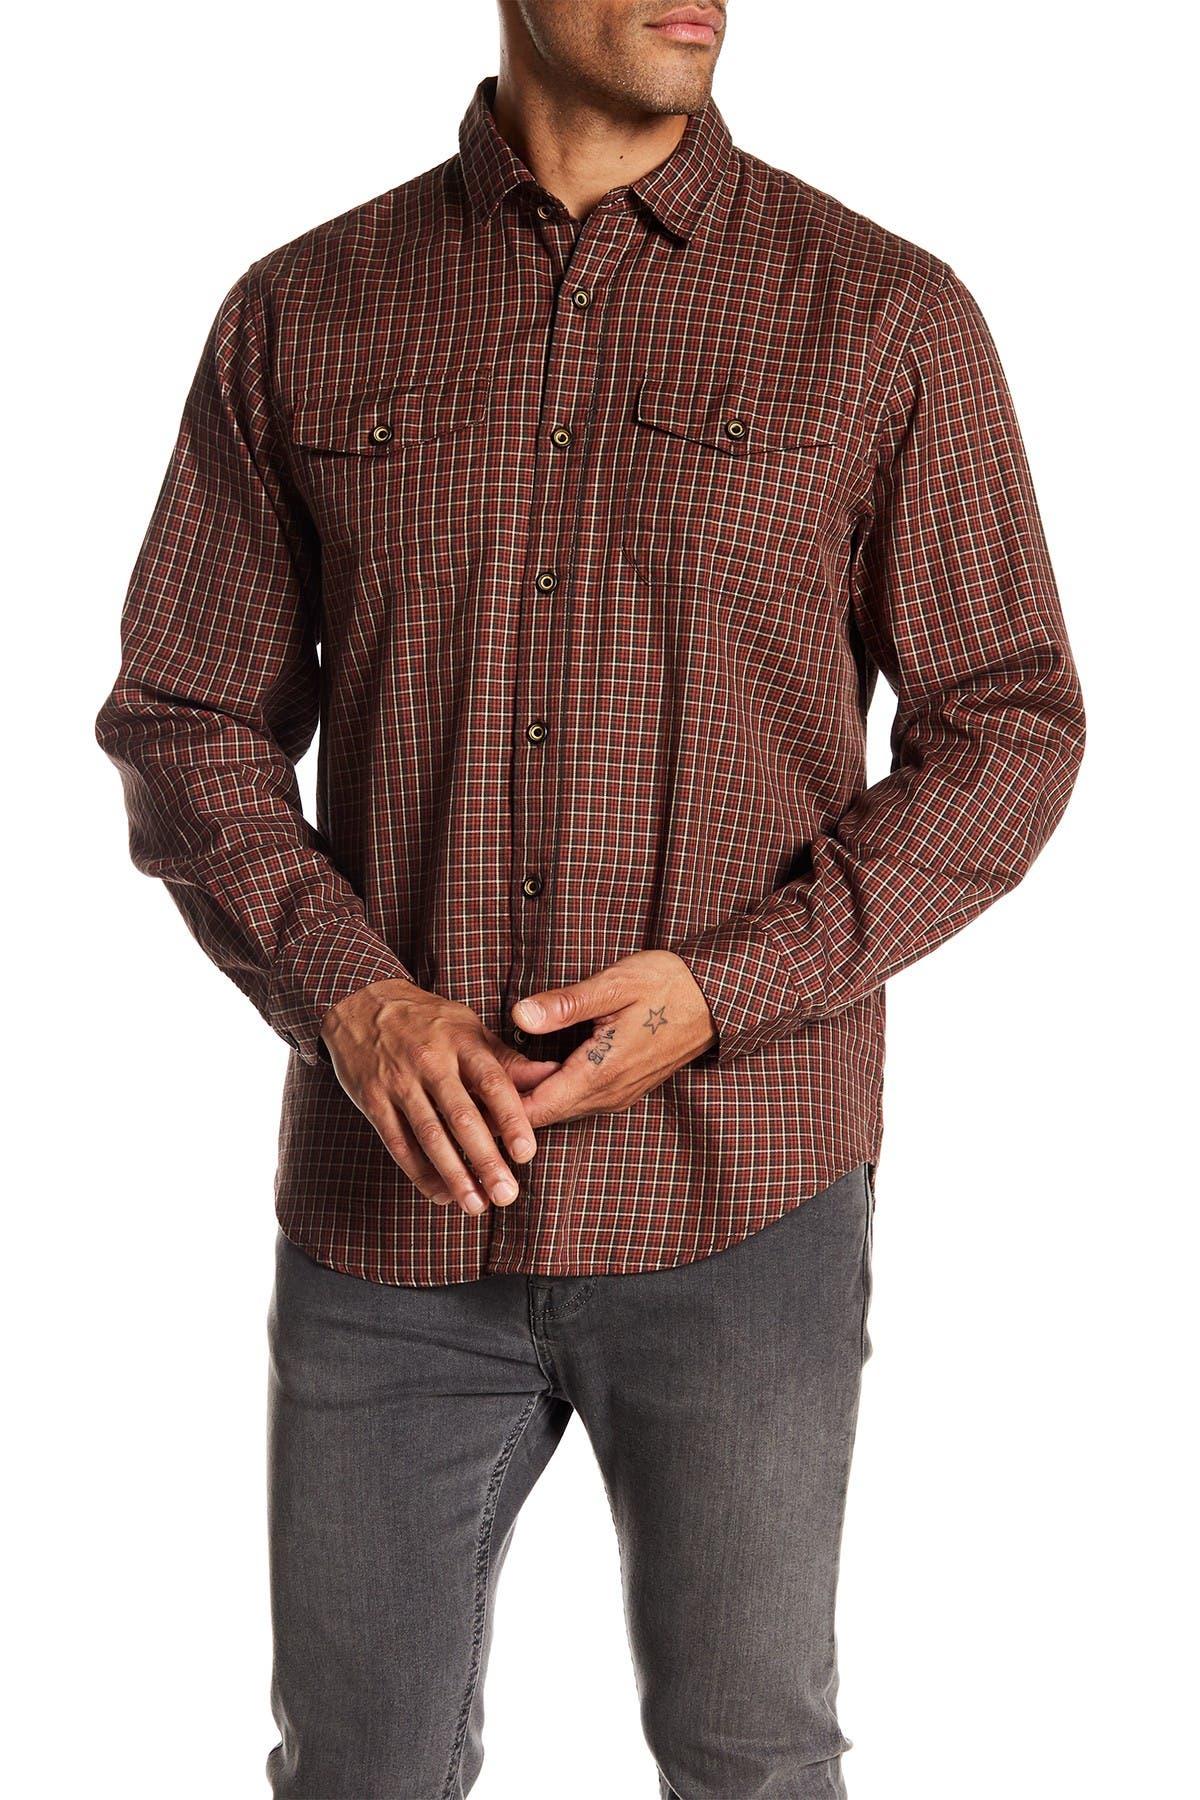 Image of COASTAORO Summit Check Print Regular Fit Shirt